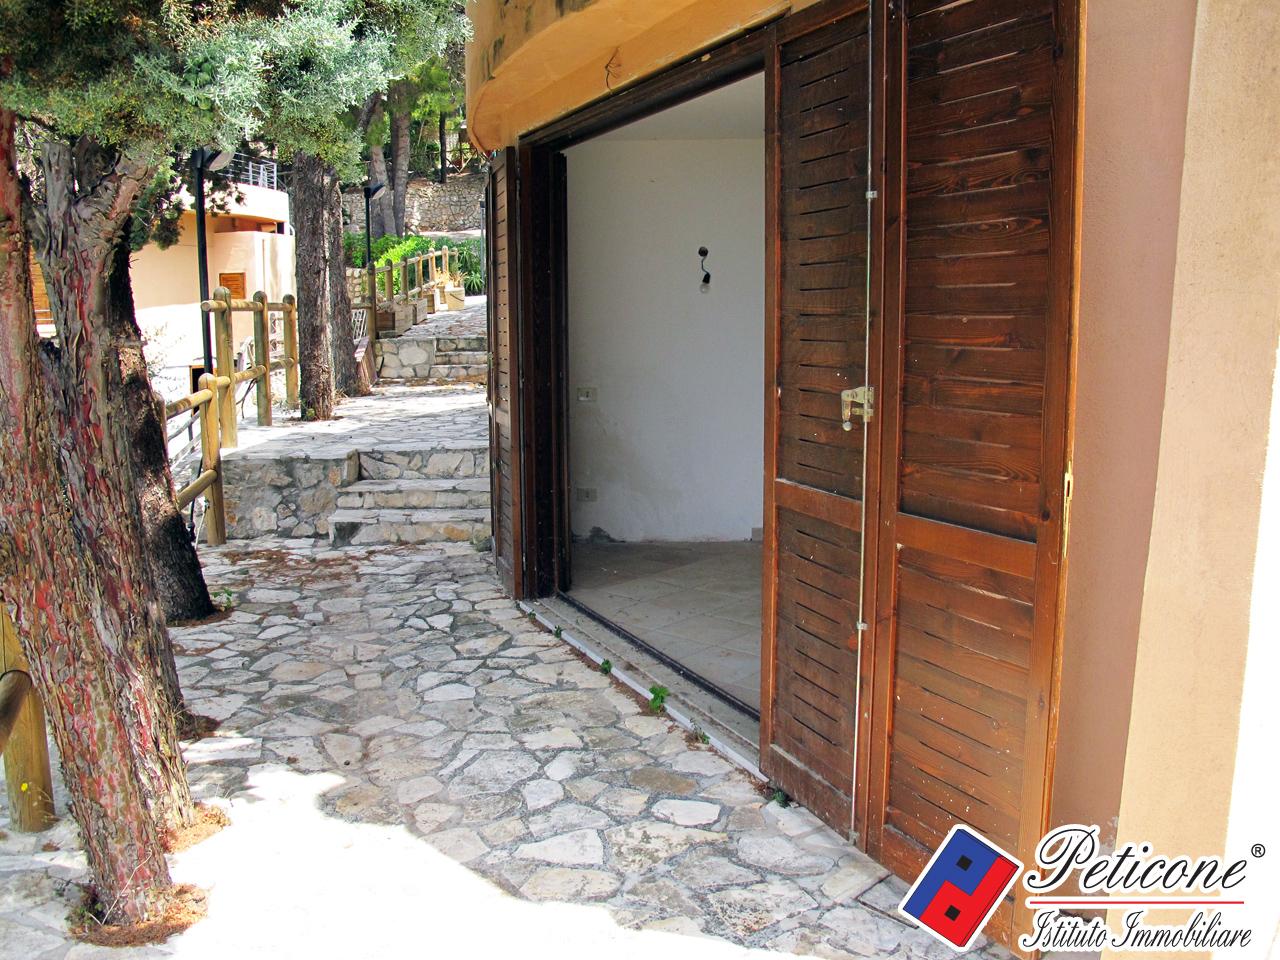 Appartamento in Vendita a Sperlonga: 1 locali, 45 mq - Foto 3